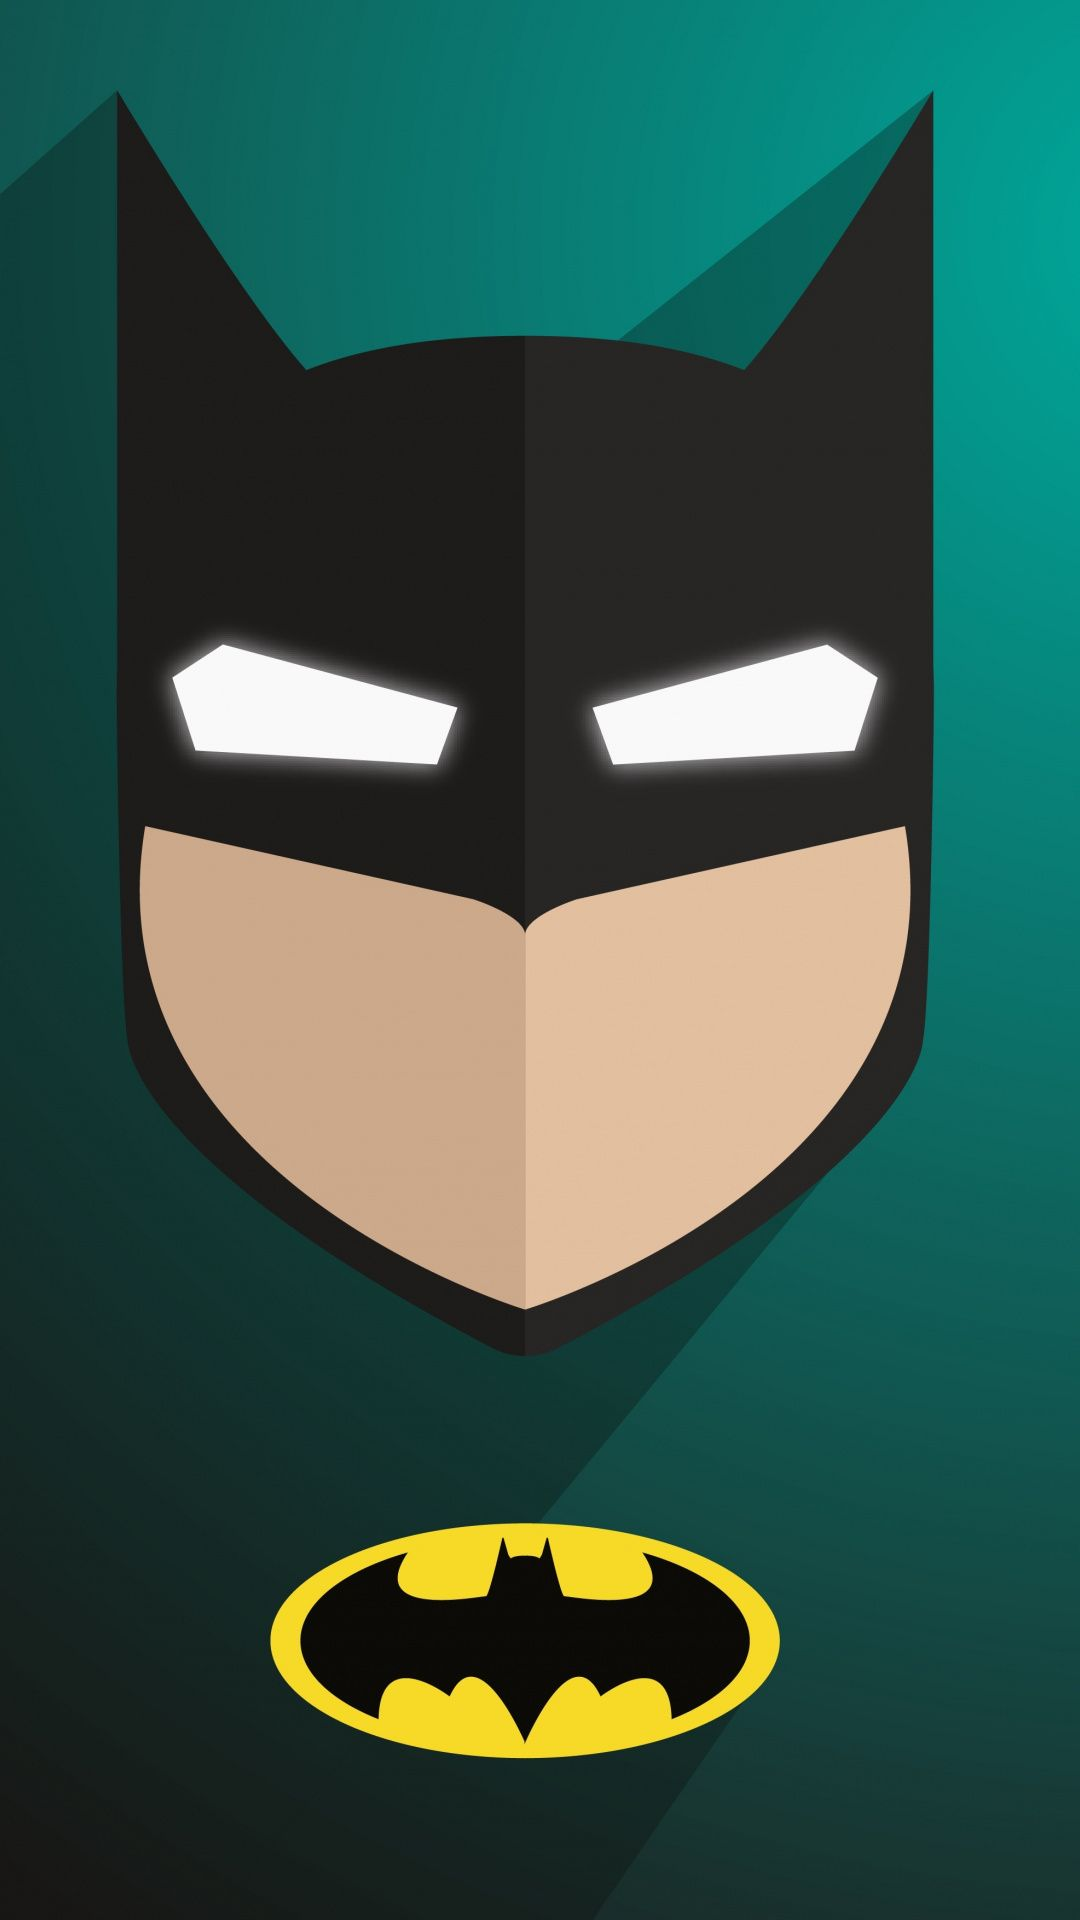 Minimal Batman Logo Art Wallpaper Batman Wallpaper Batman Superman Comic Cute Batman